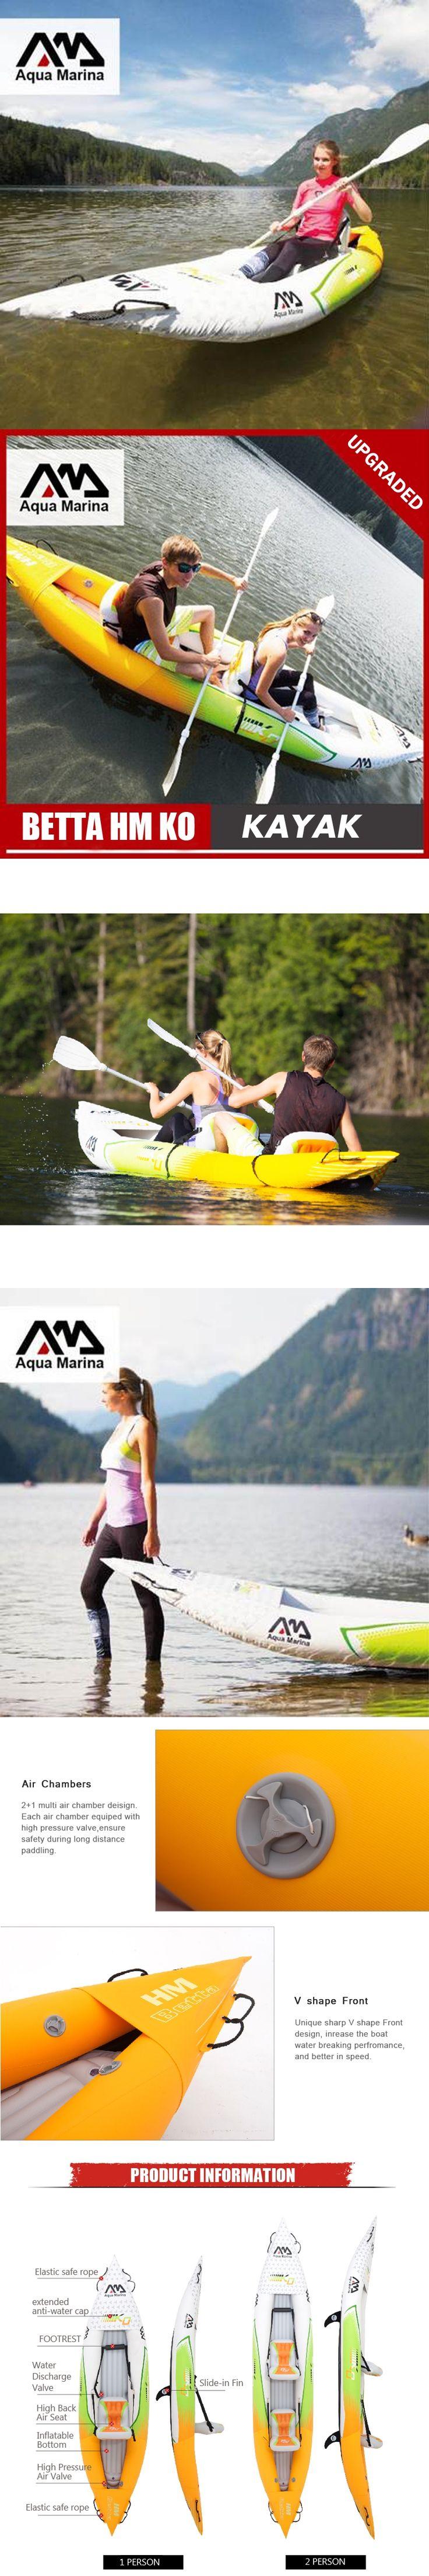 Aqua Marina inflatable boat fishing sport kayak canoe Betta HM pvc dinghy raft aluminium paddle pump seat drop-stitch laminated